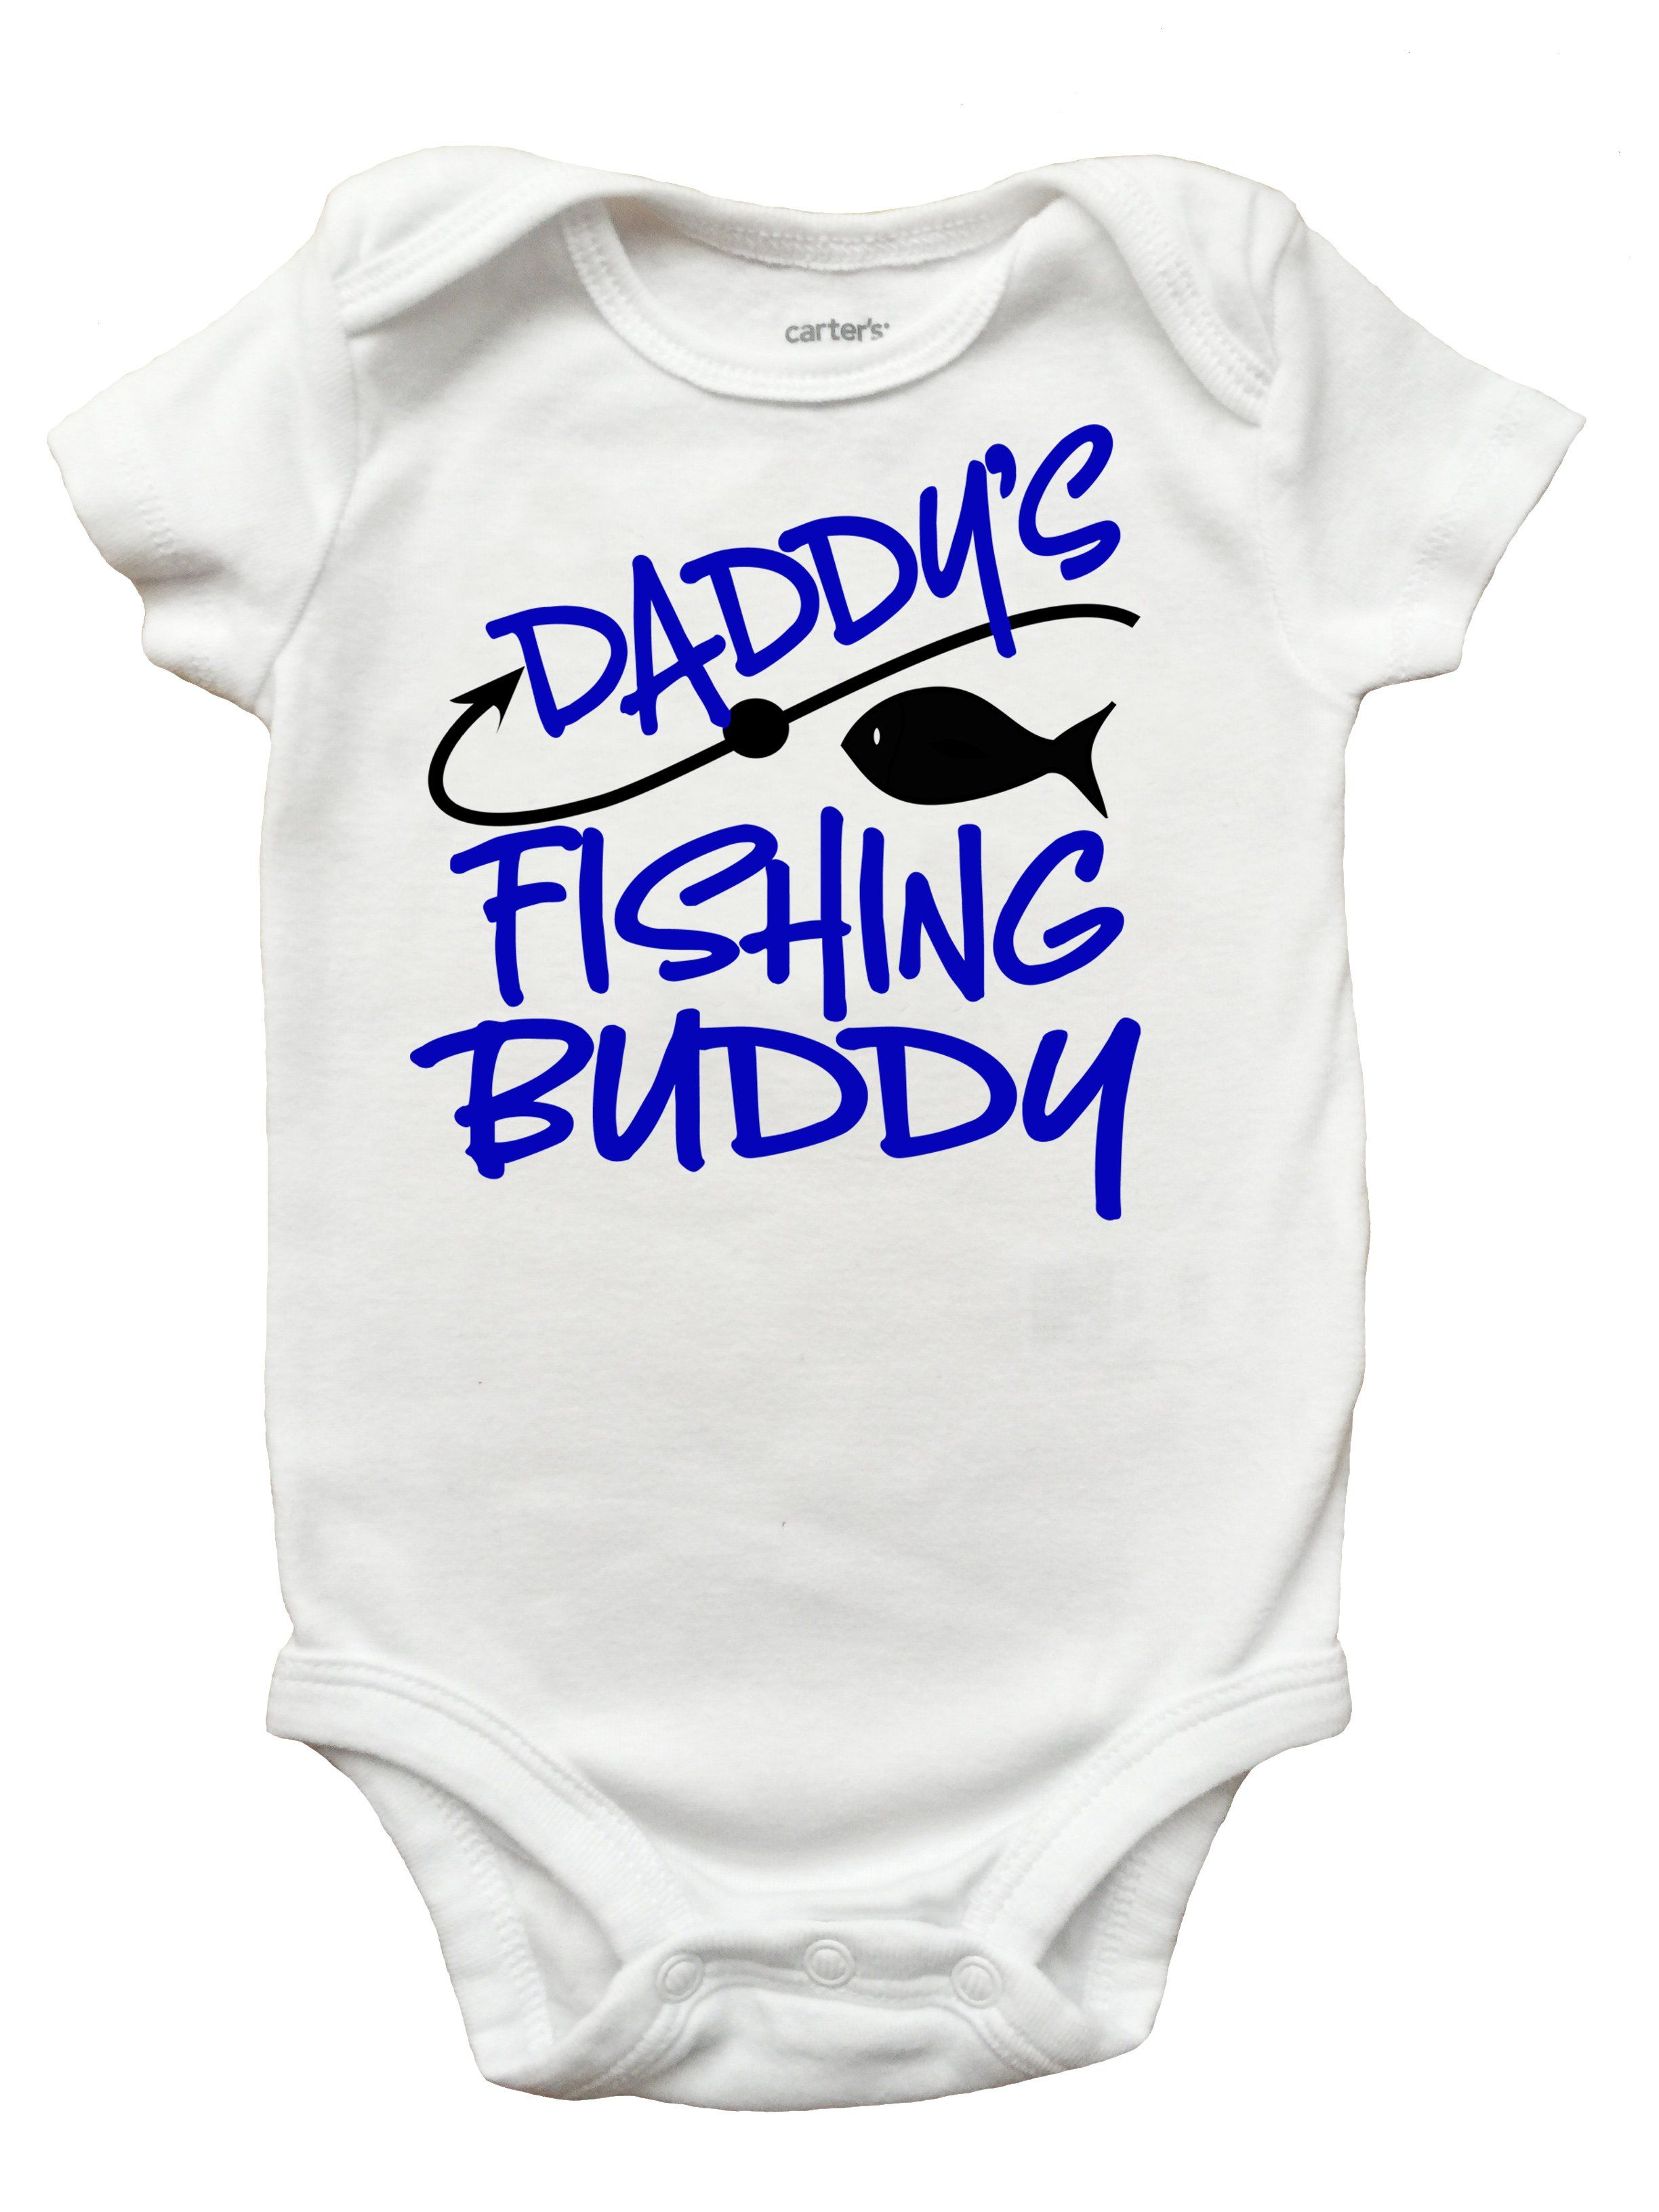 Daddy/'s Fishing Buddy Bodysuit Daddy/'s Fishing Buddy Shirt